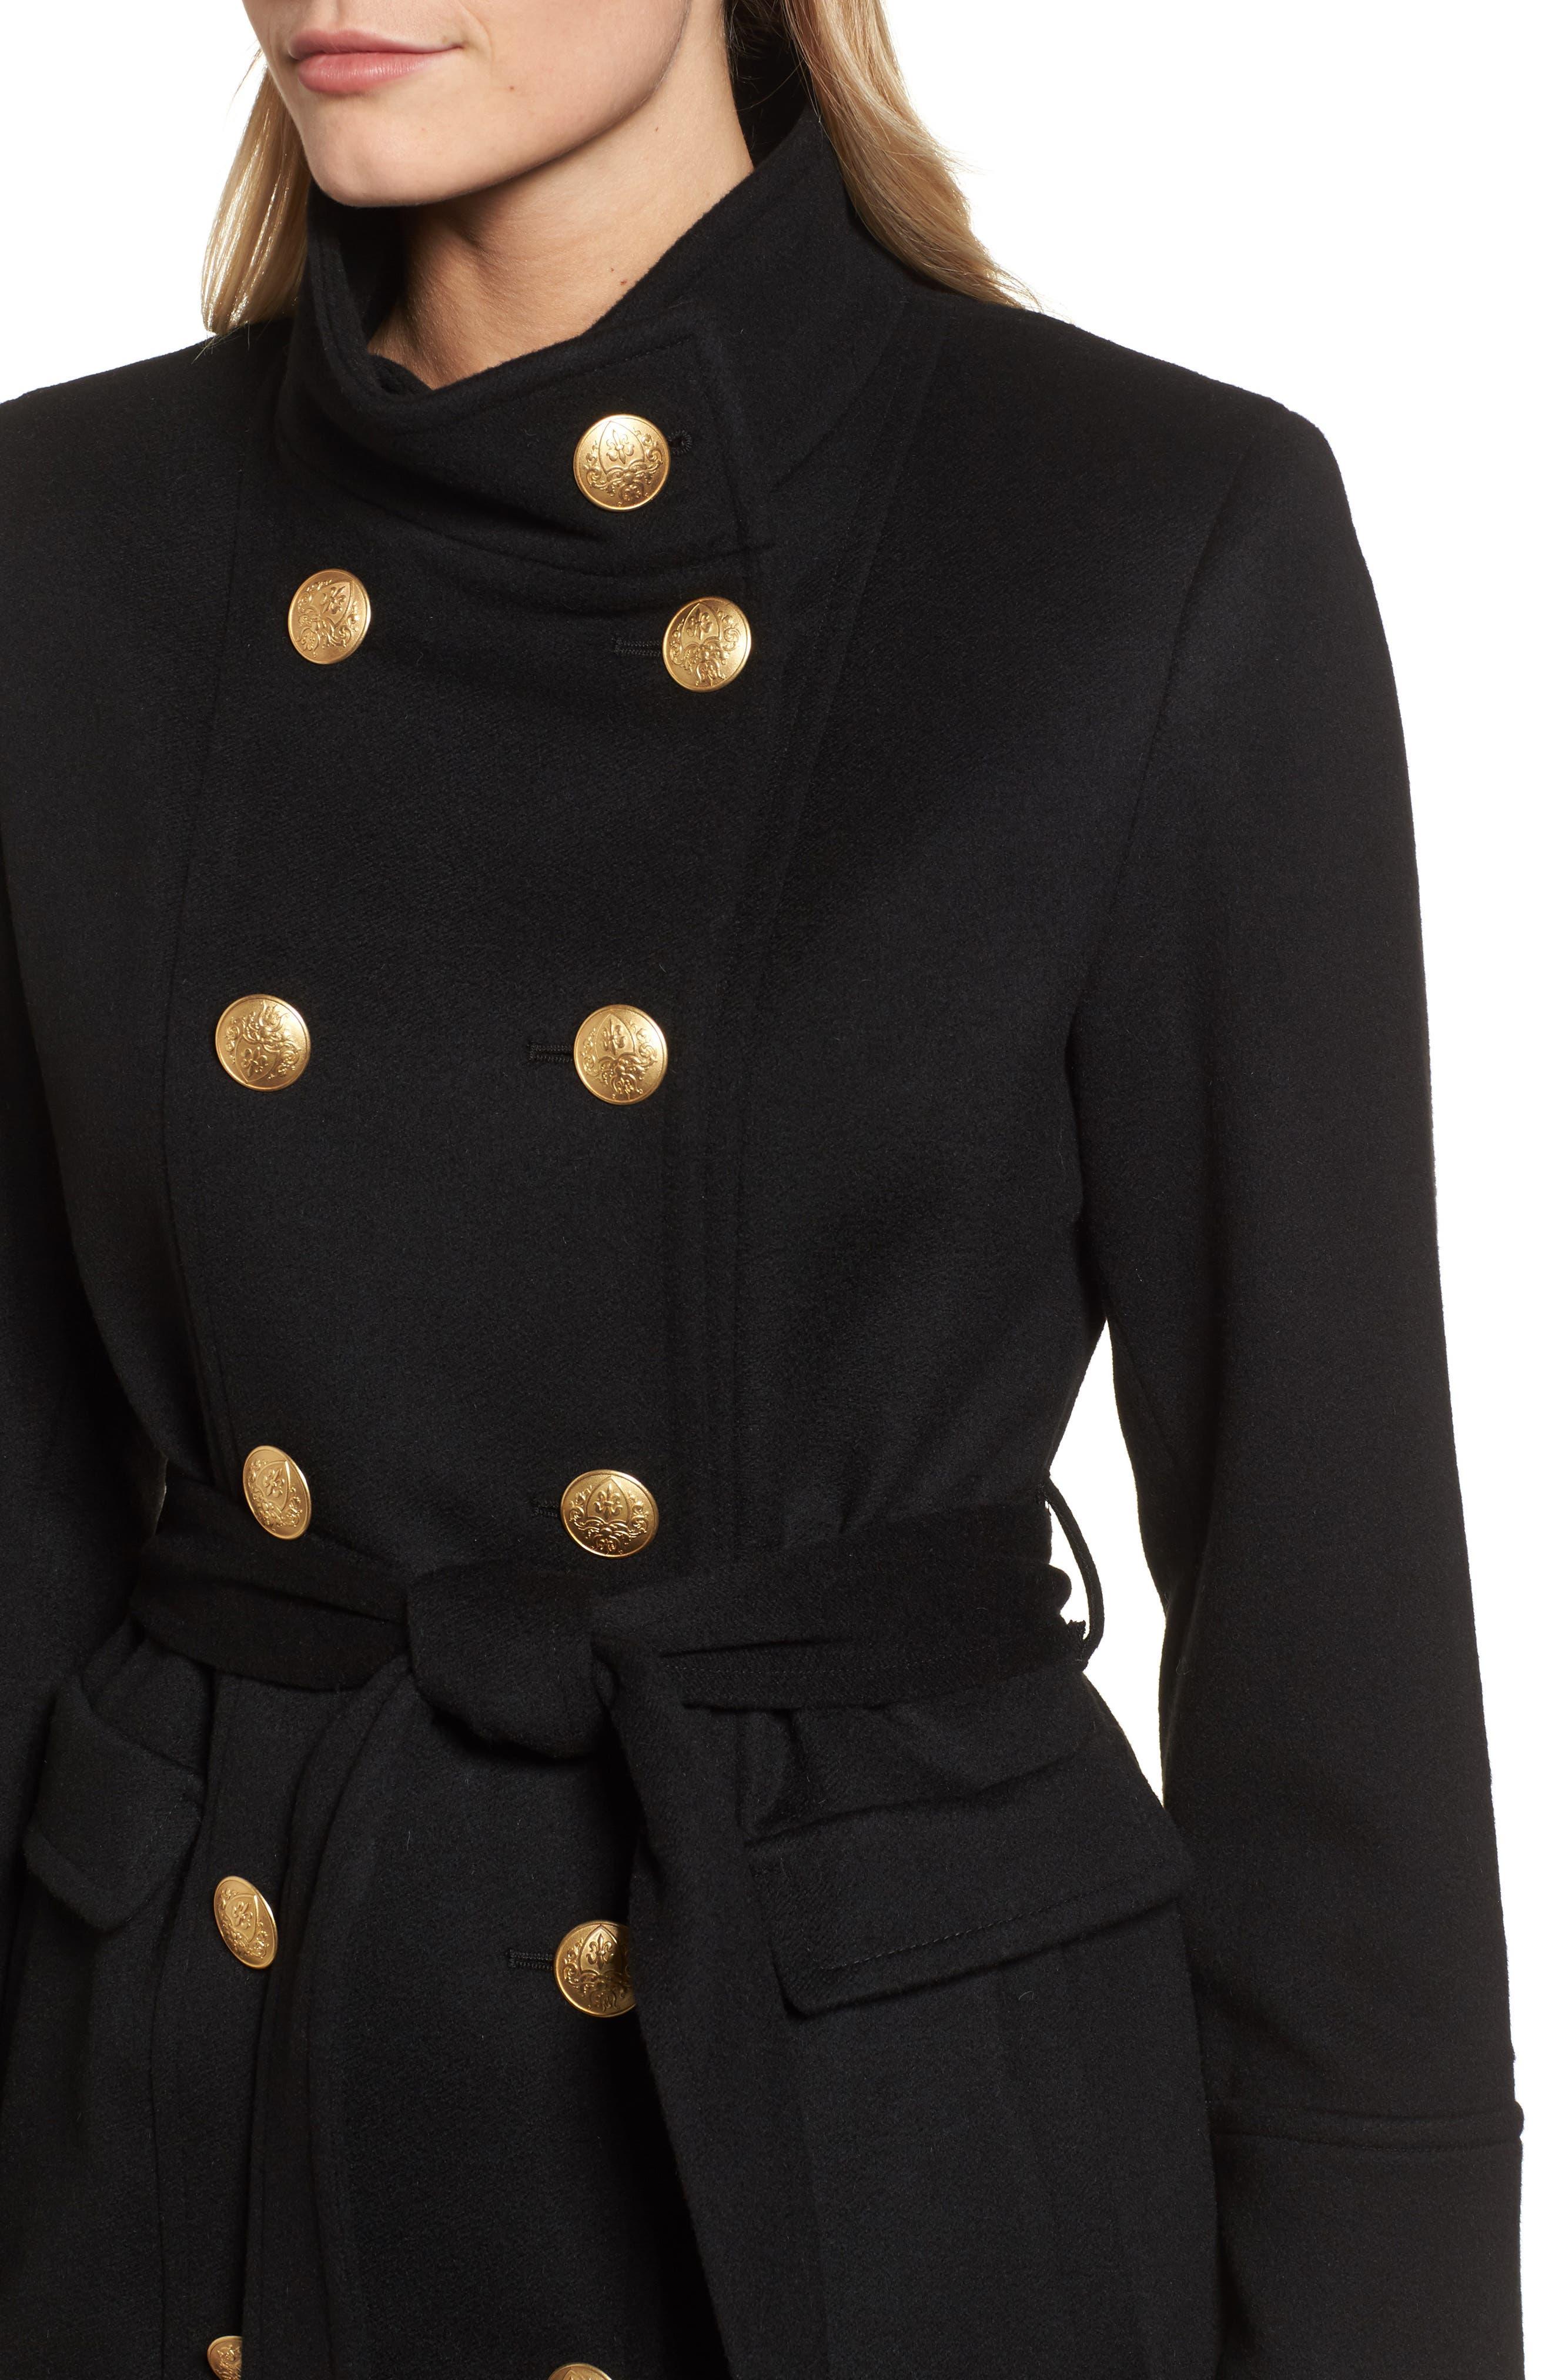 Wool & Cashmere Blend Military Coat,                             Alternate thumbnail 4, color,                             001